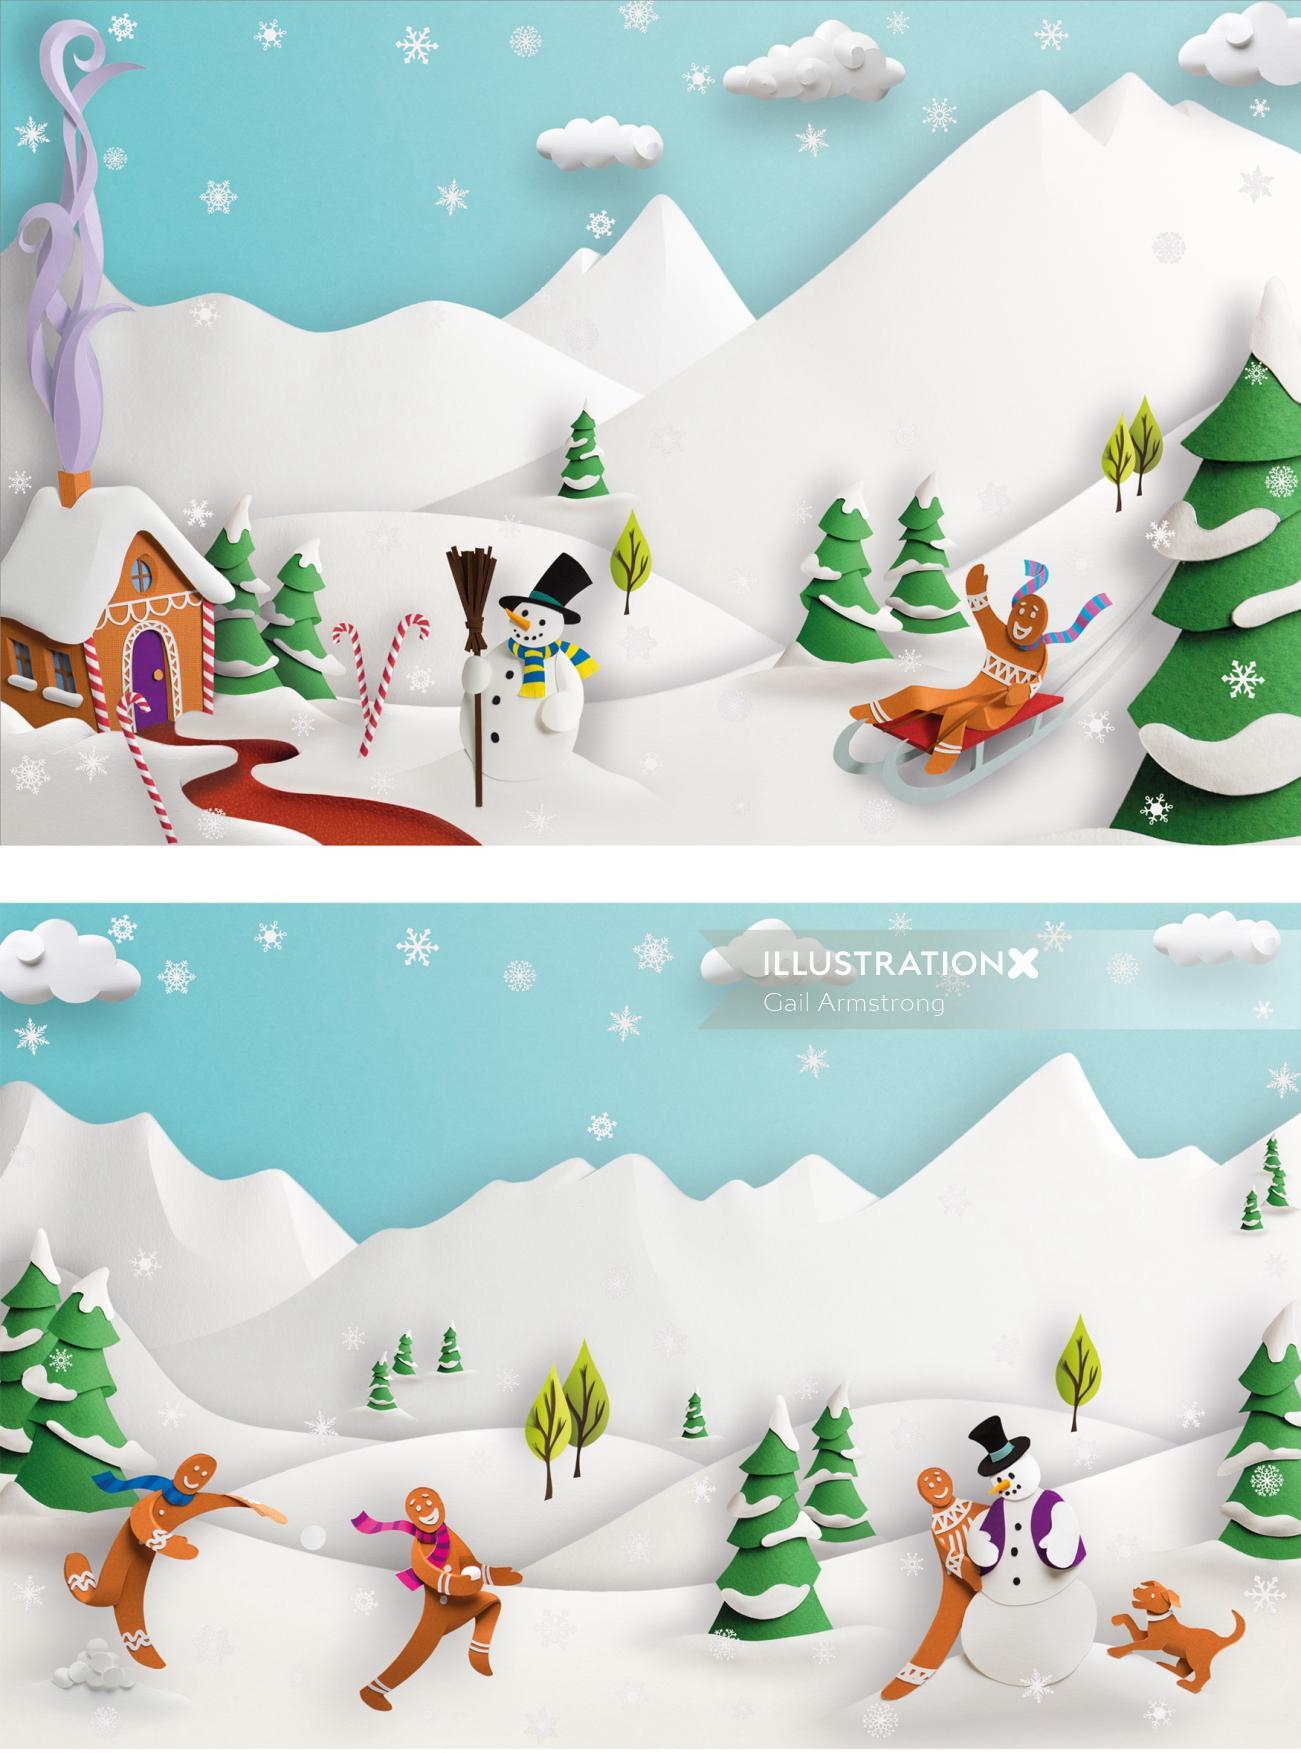 Snowman and Christmas season paper art illustration